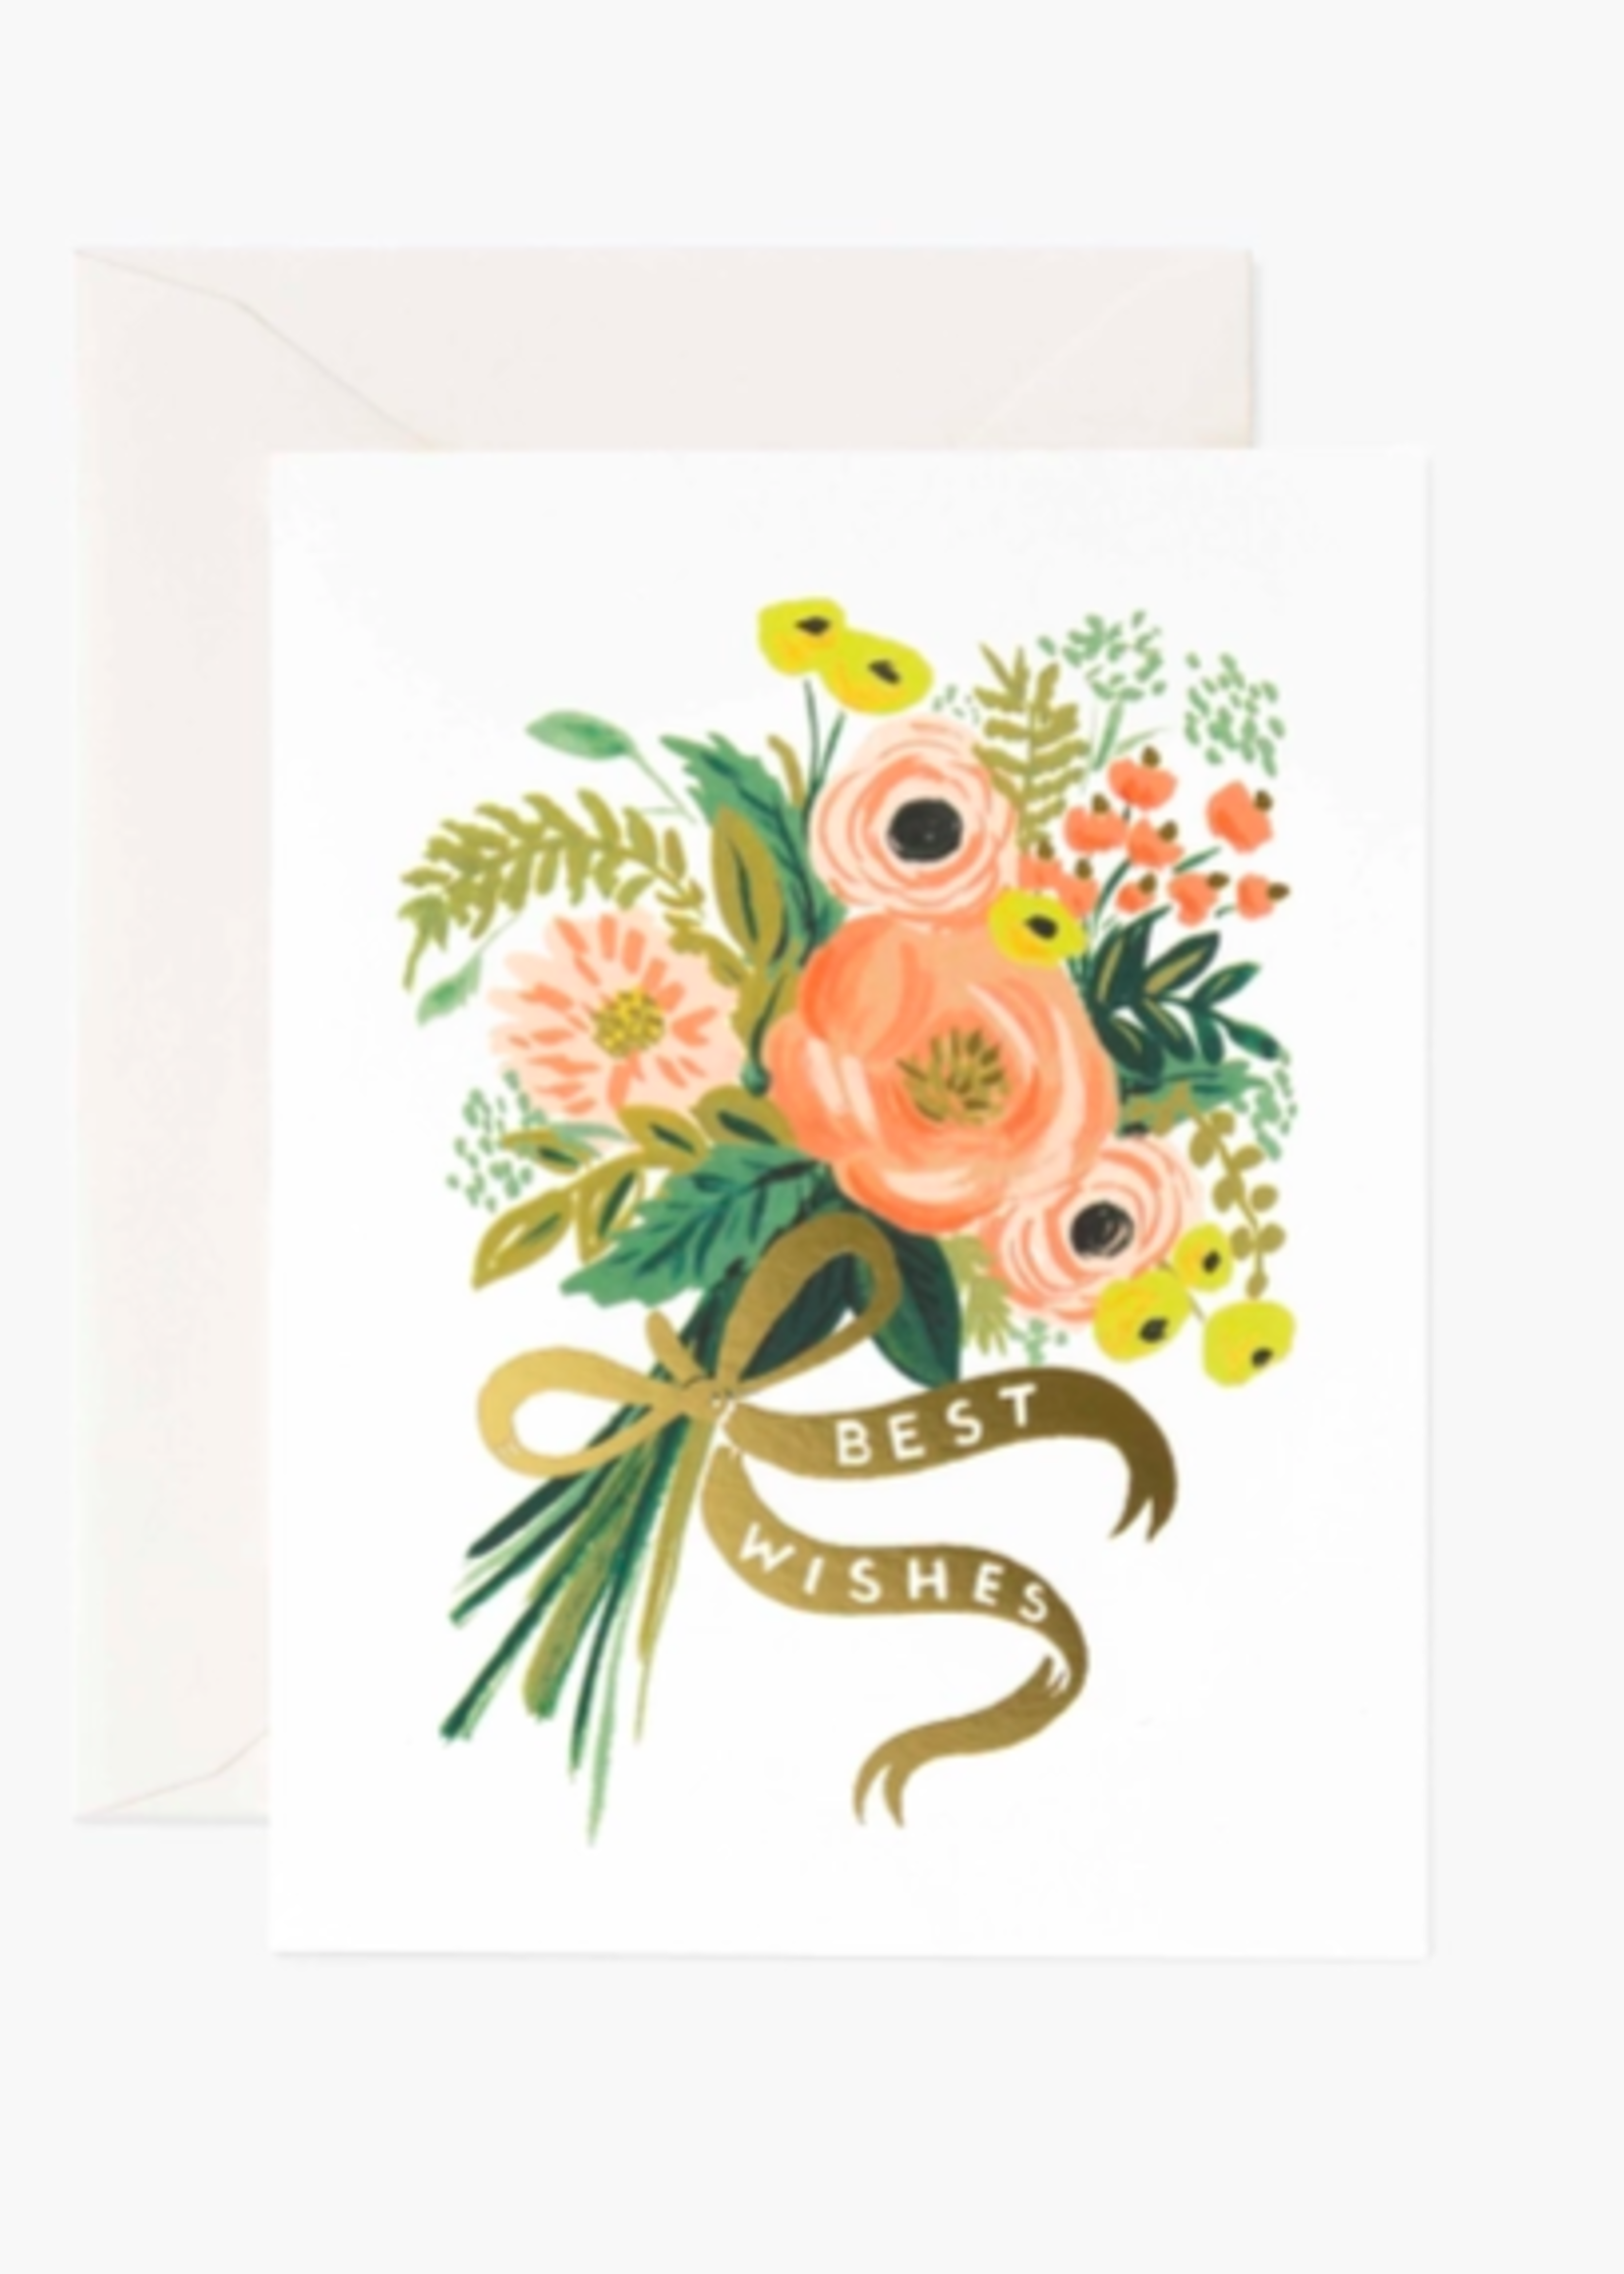 Best Wishes Bouquet Card